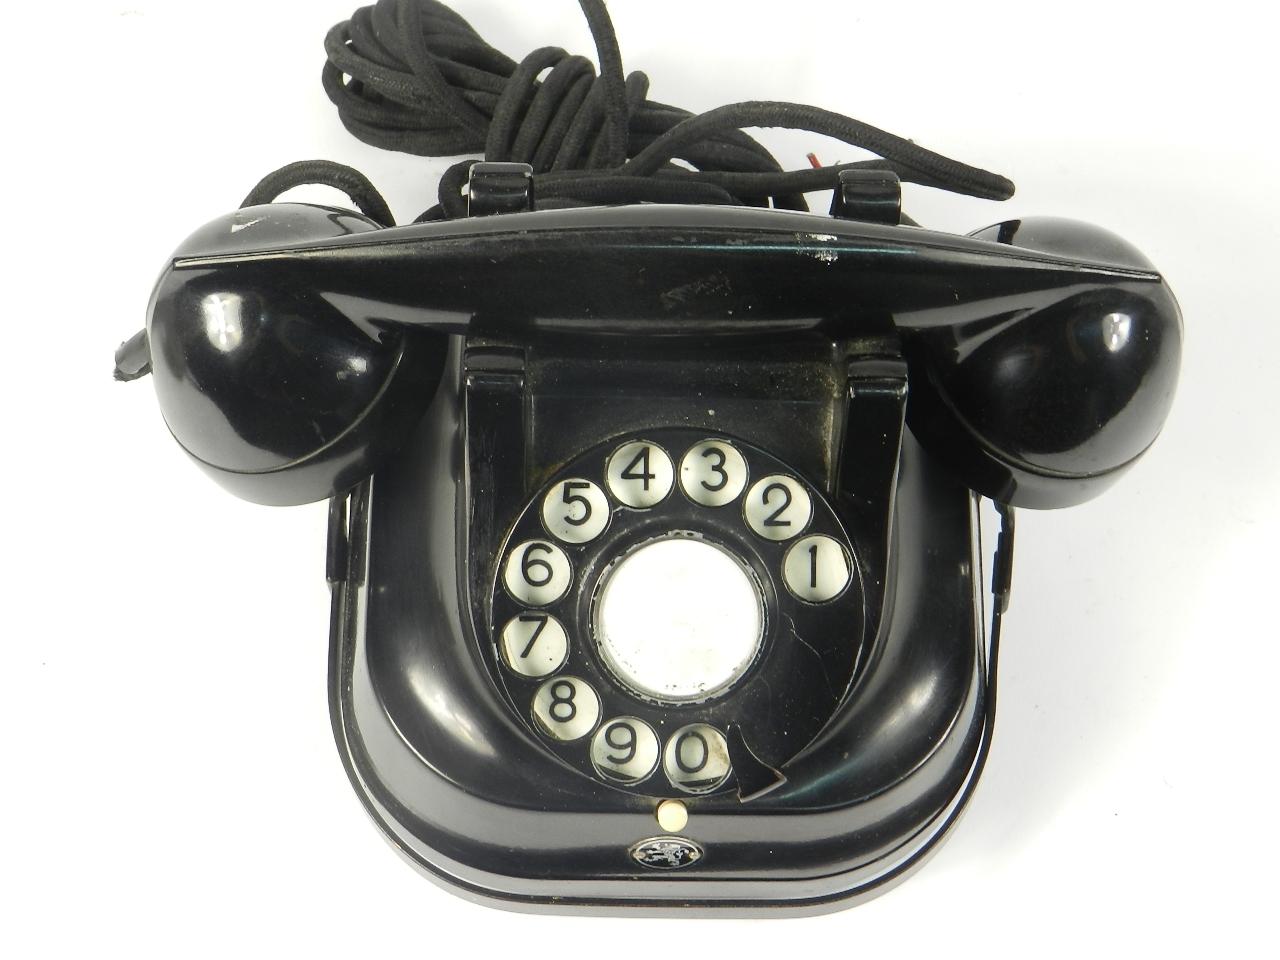 Imagen TELEFONO SOBREMESA NEGRO AÑO 1940 35344